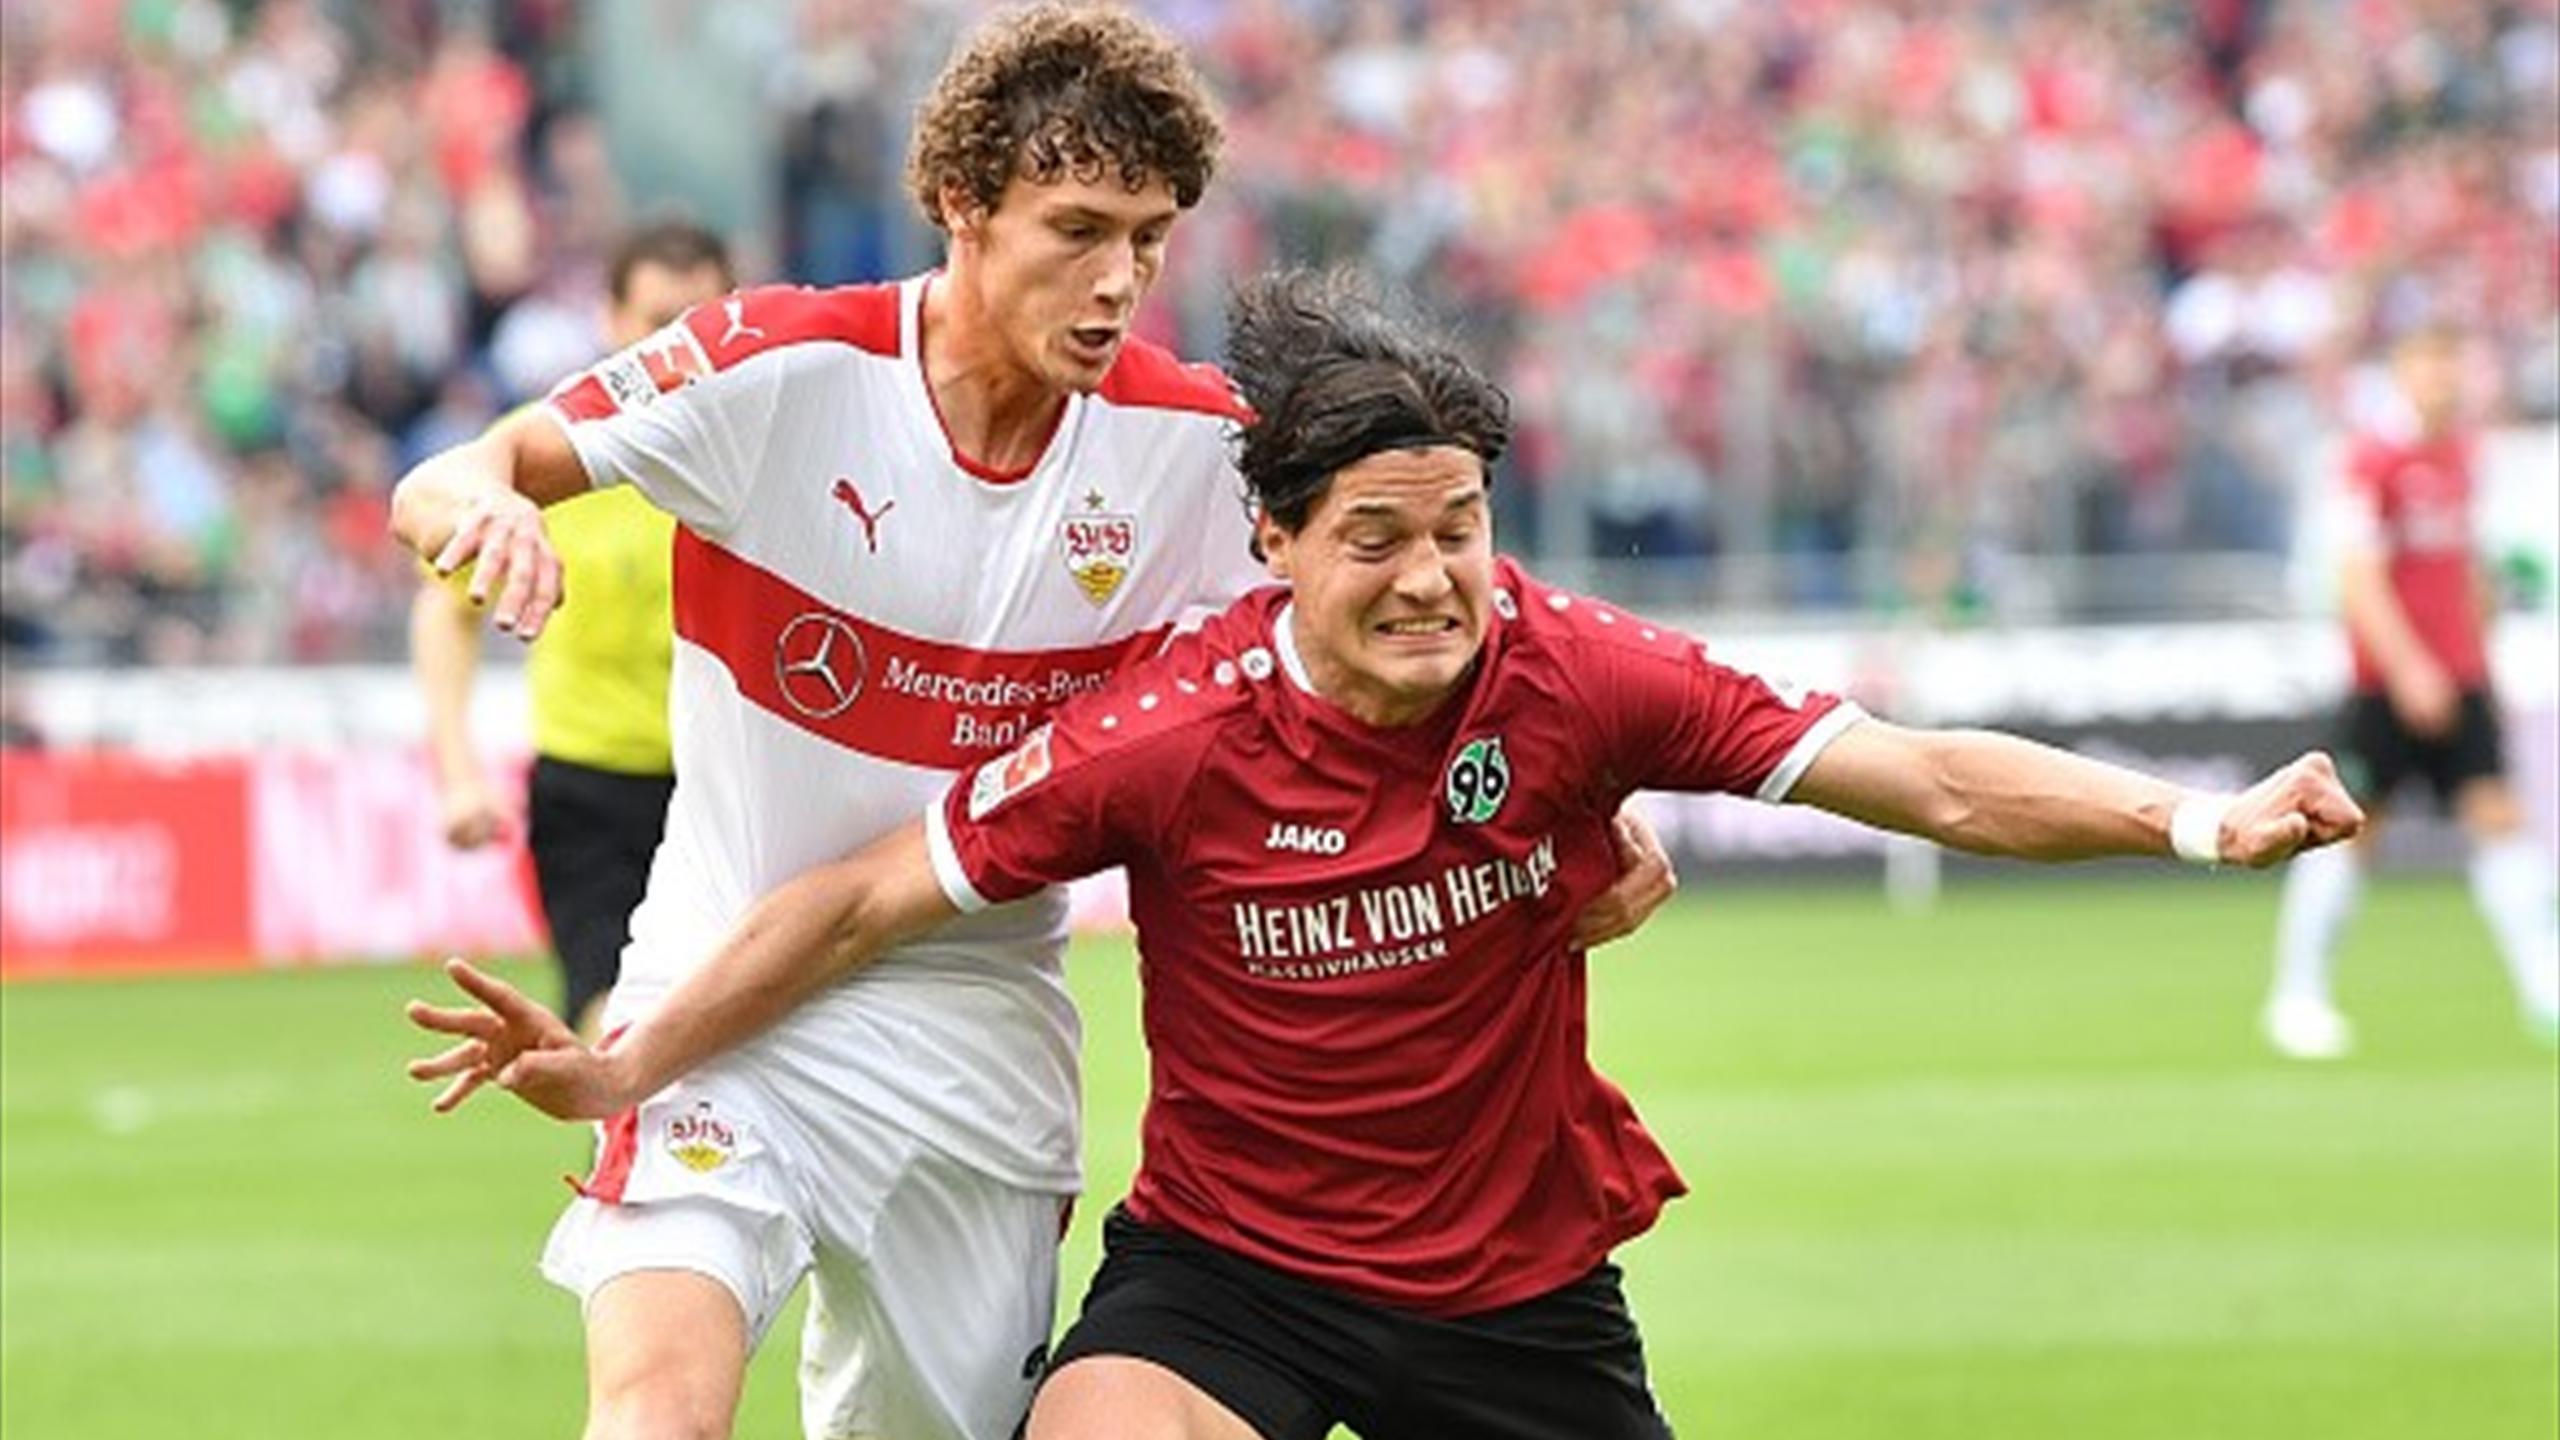 Stuttgart Gegen Hannover 96